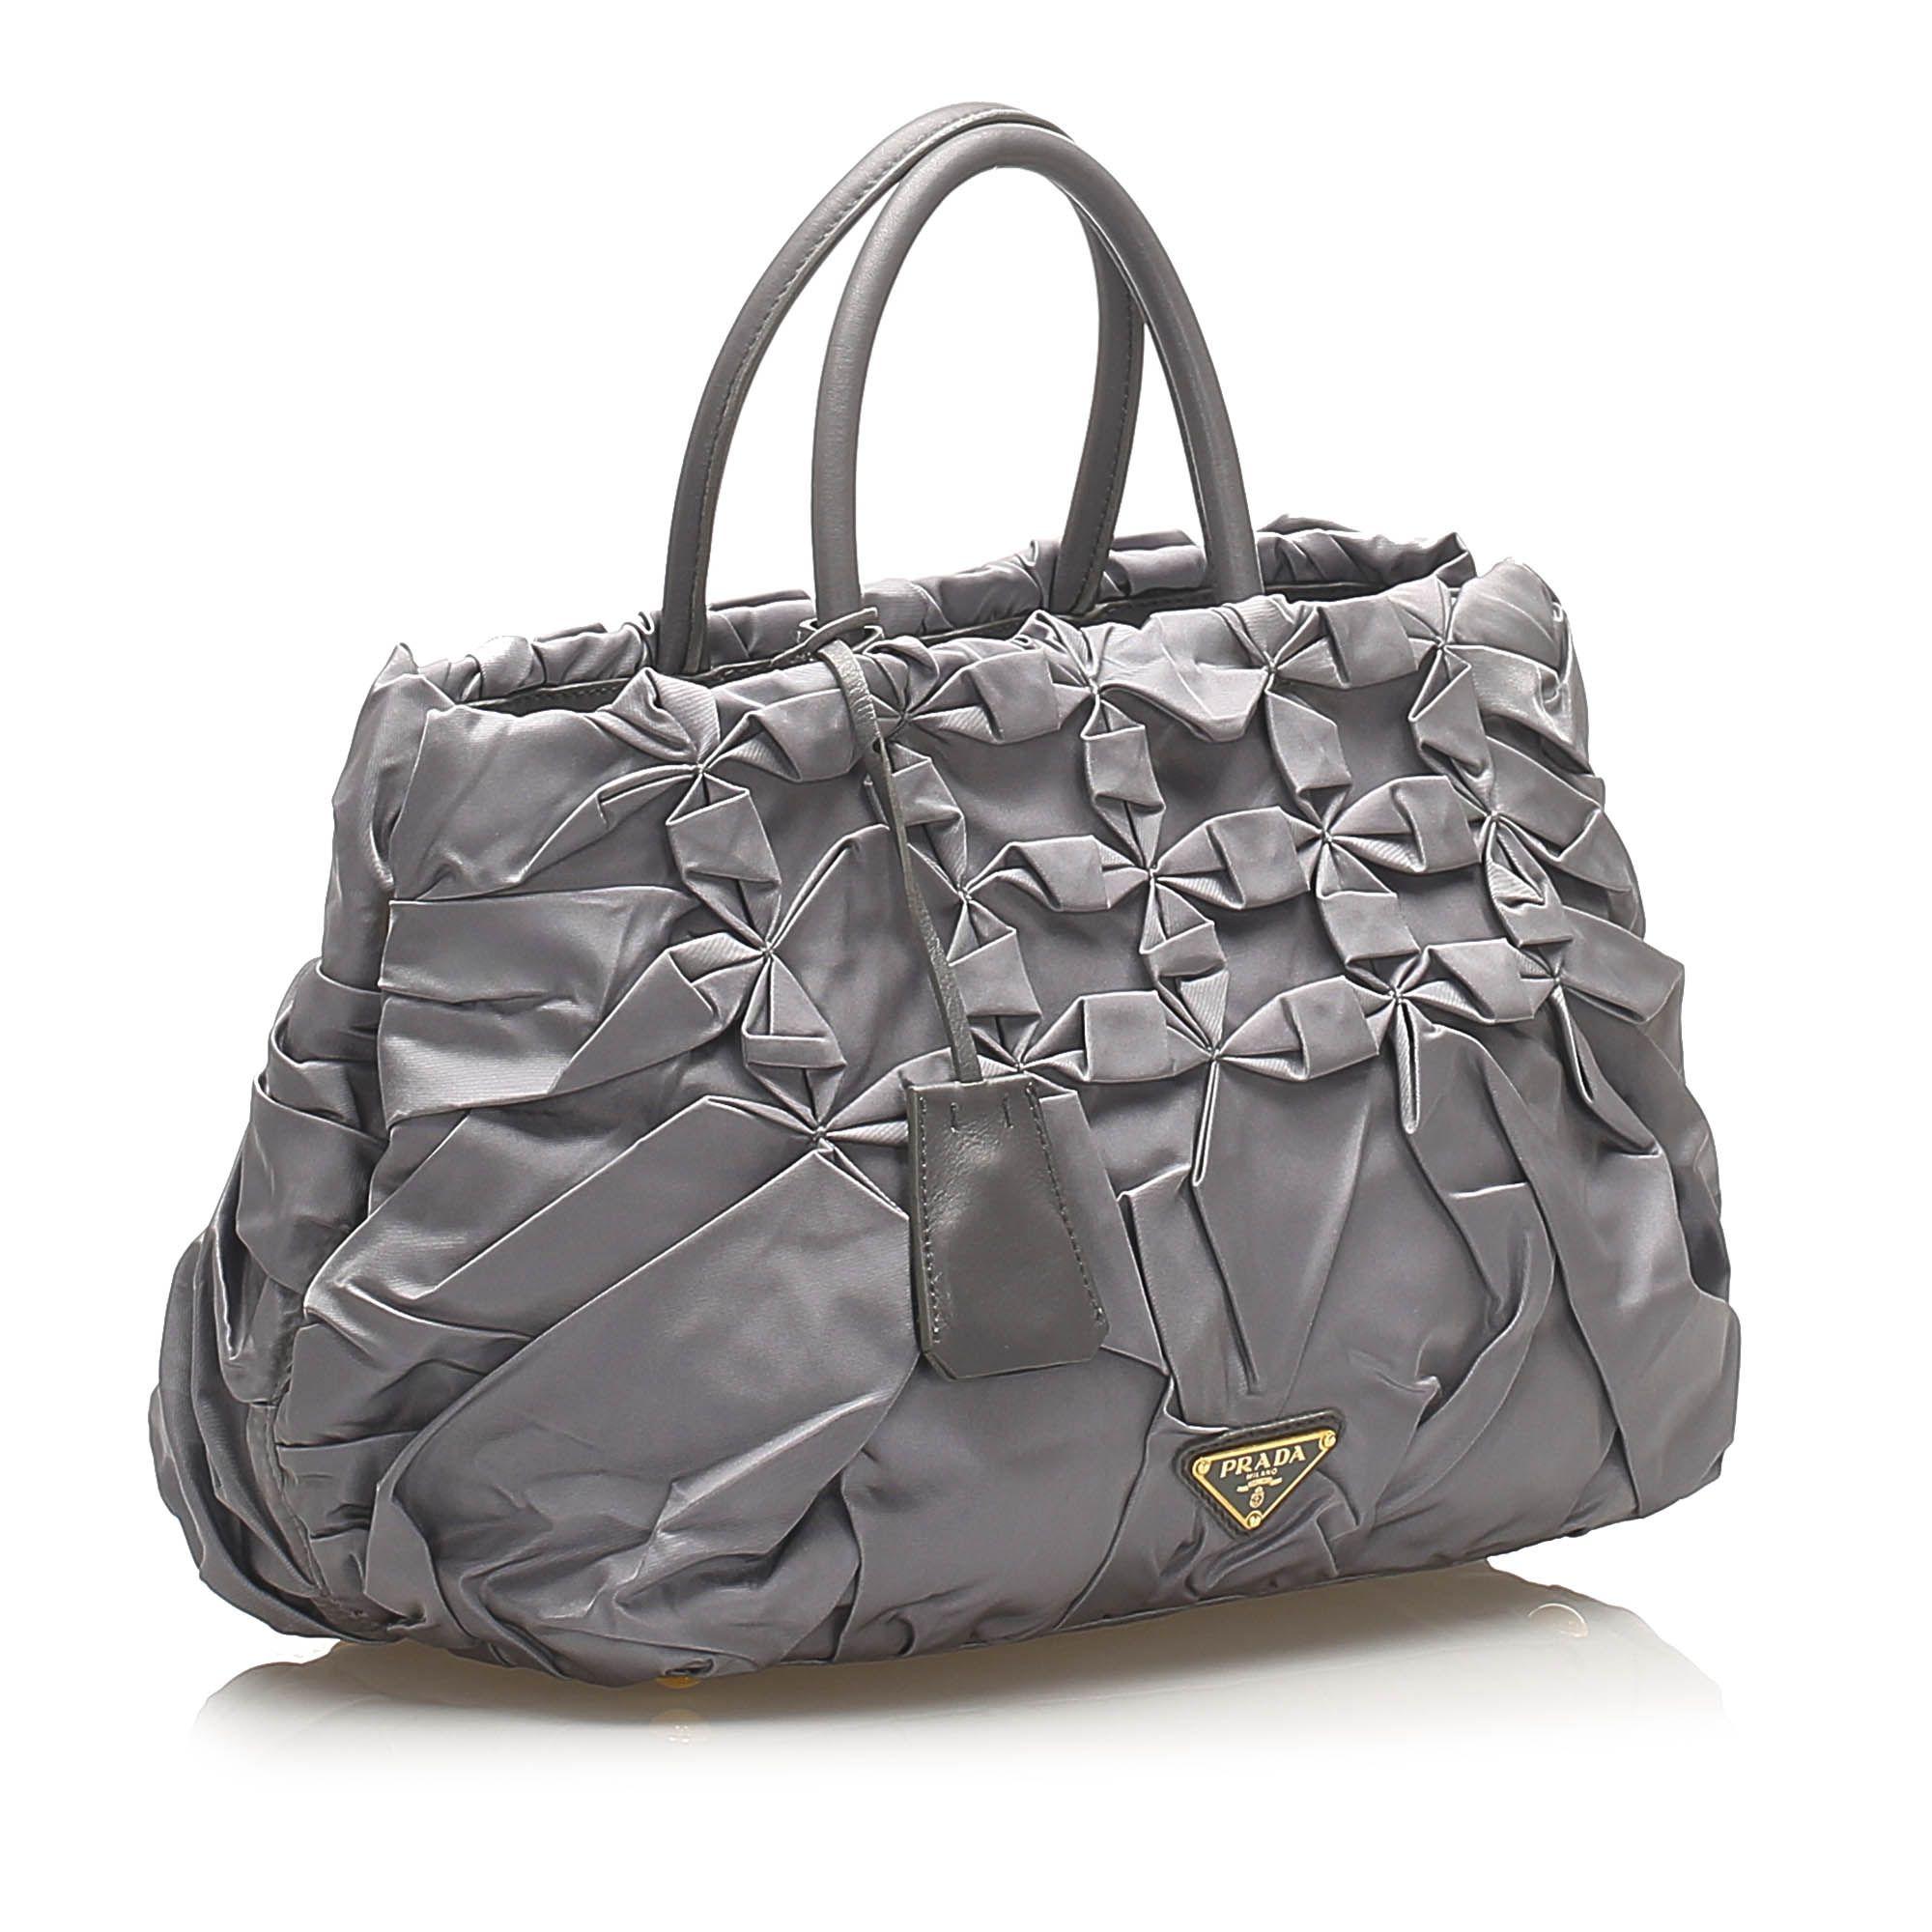 Vintage Prada Gathered Tessuto Tote Bag Gray